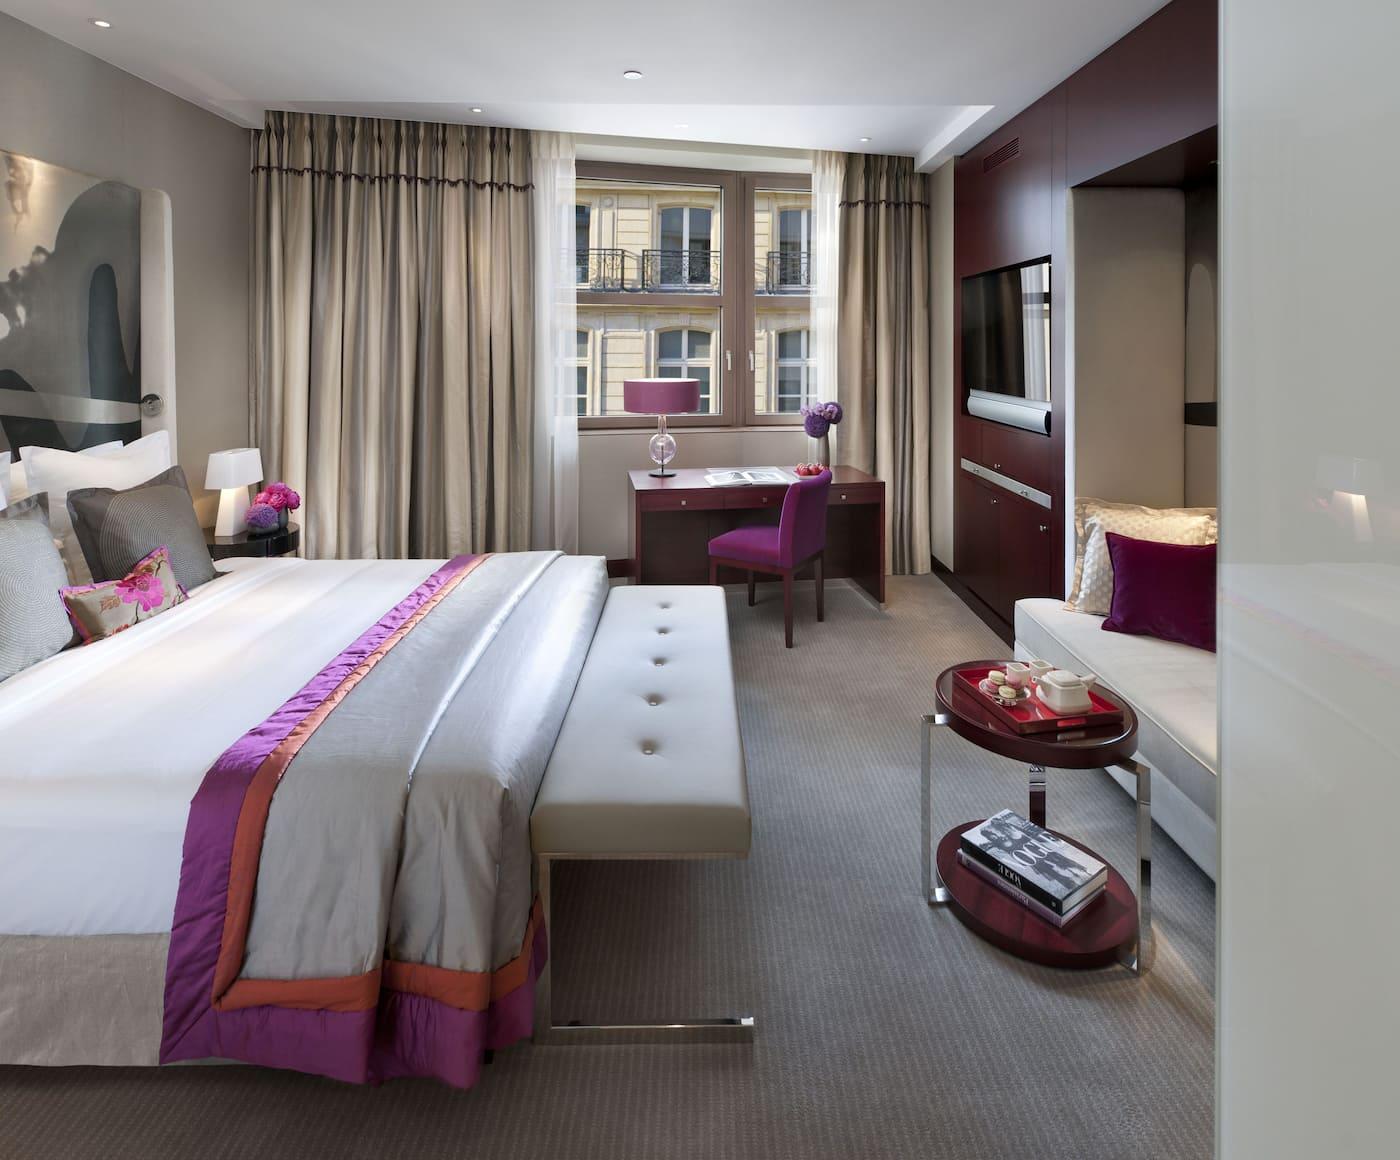 luxury hotels paris mandarin oriental paris. Black Bedroom Furniture Sets. Home Design Ideas